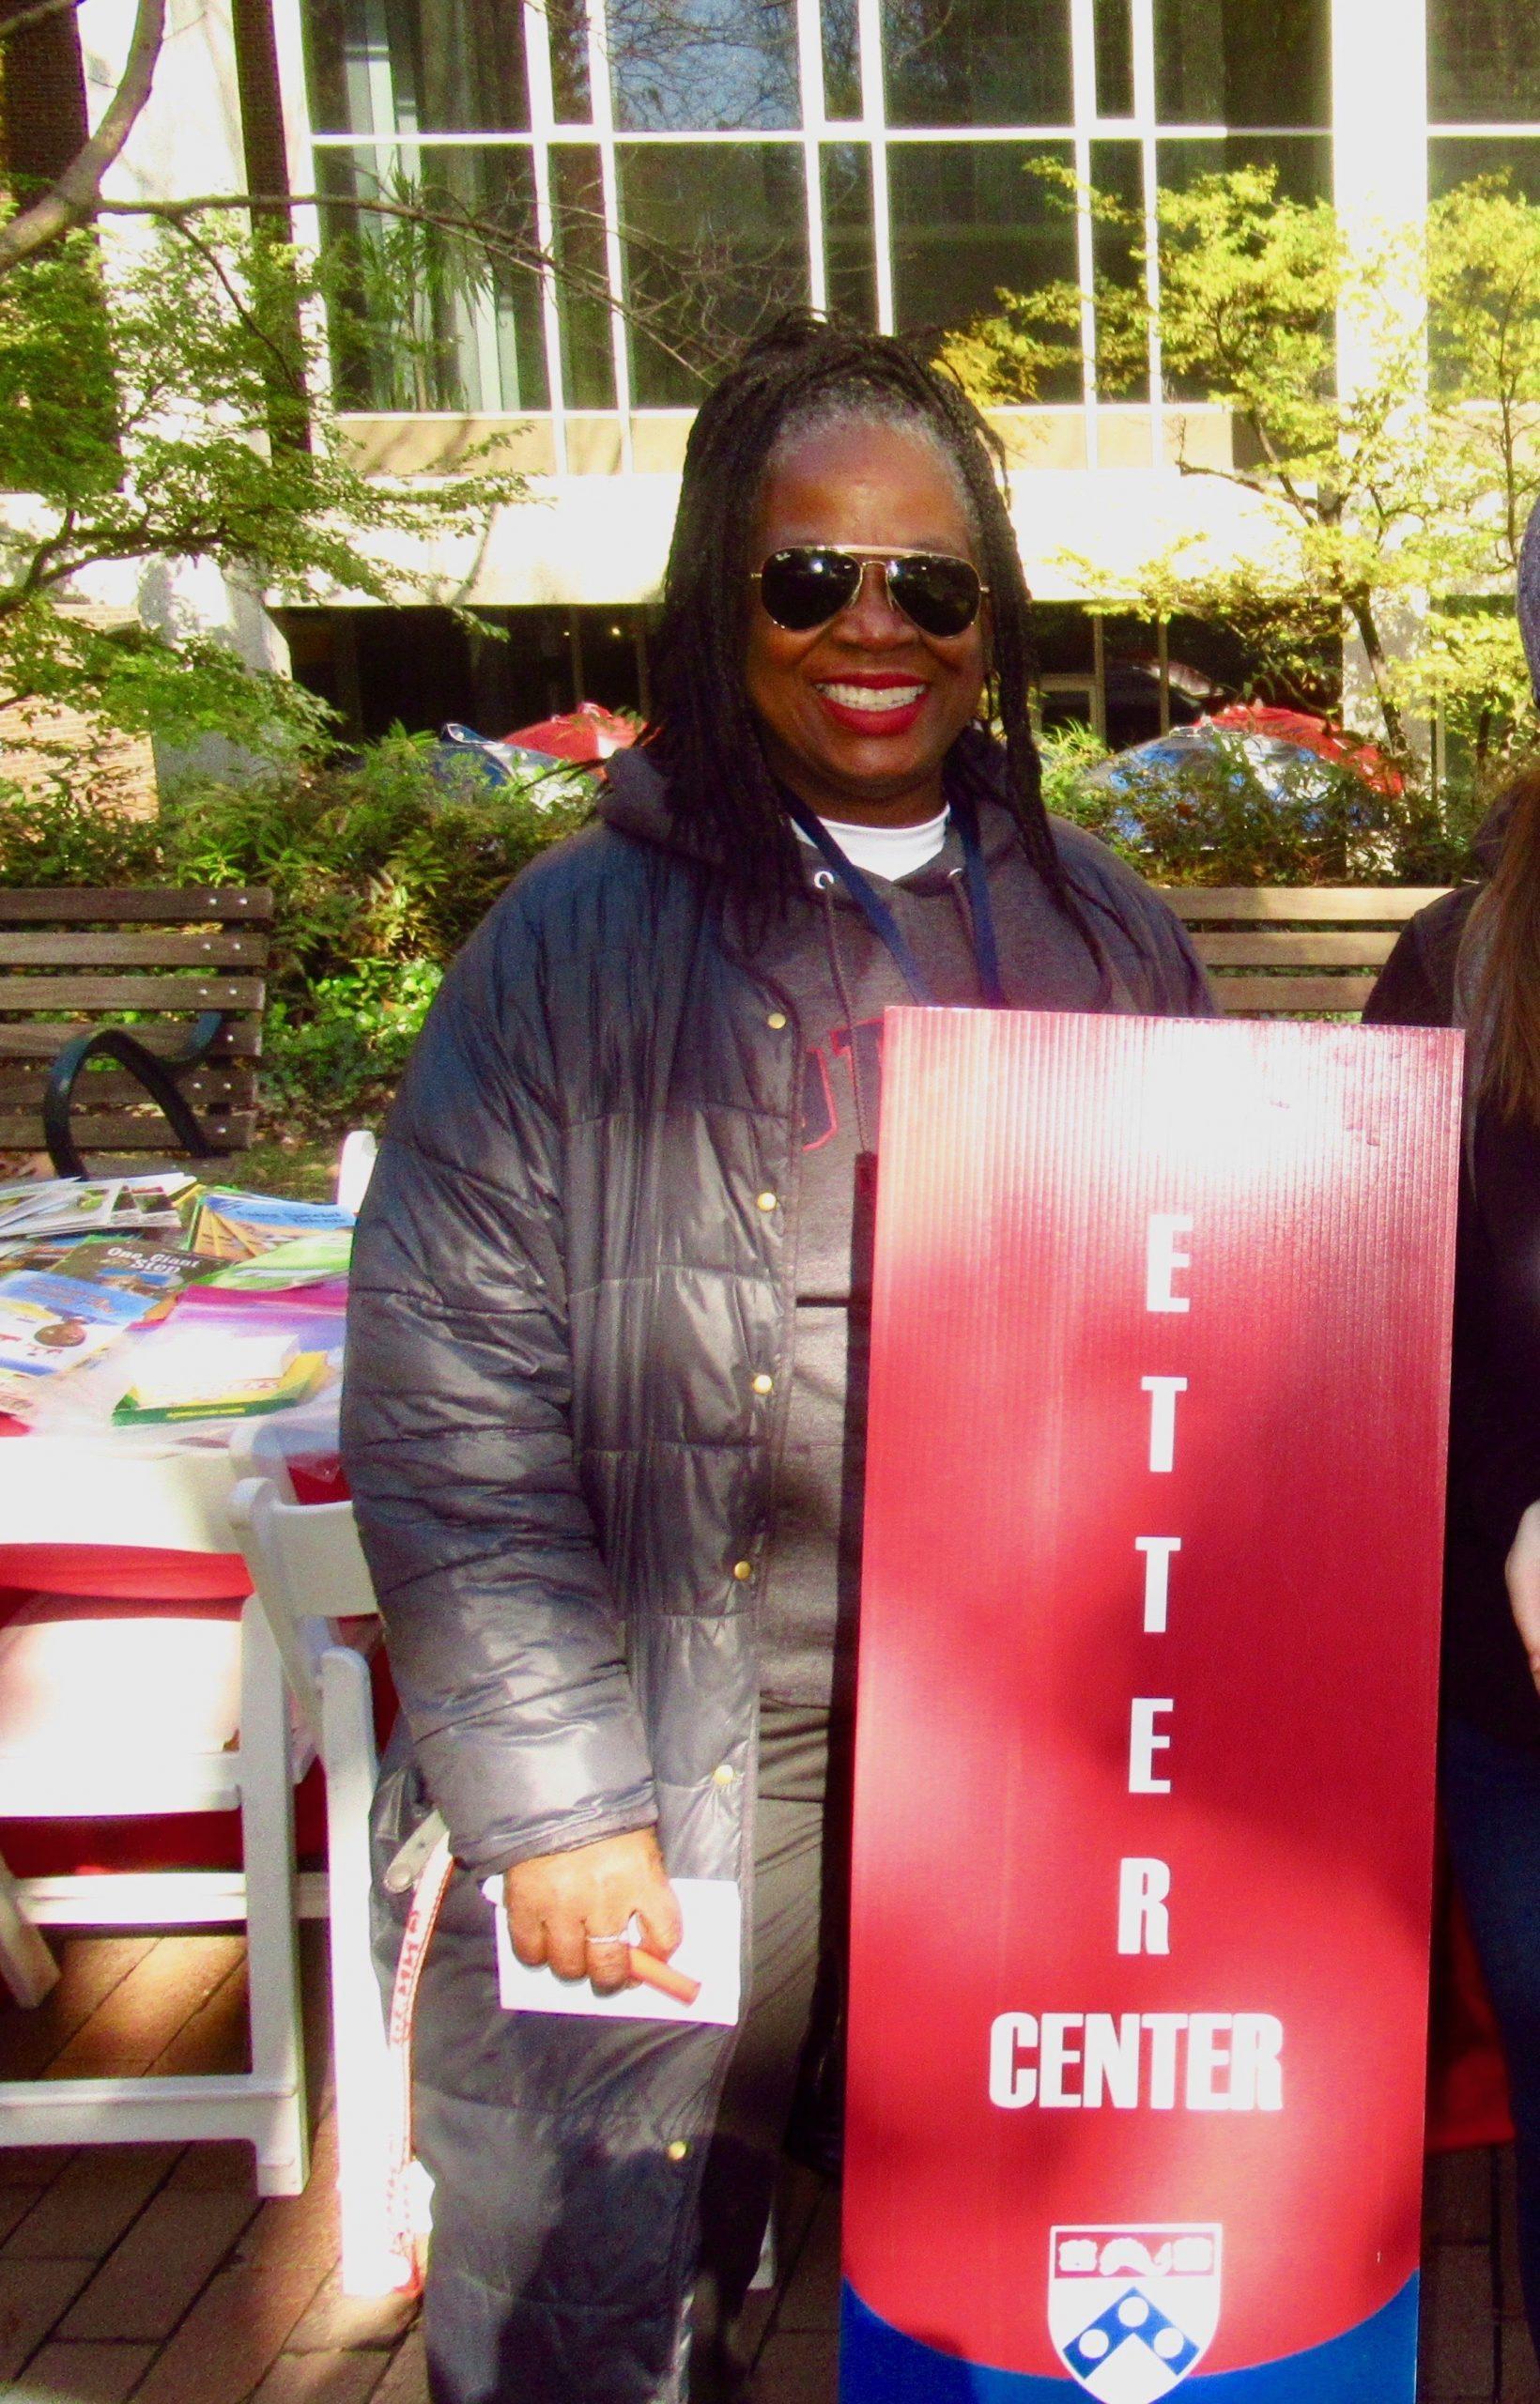 Isabel, The Netter Center for Community Partnerships at the University of Pennsylvania